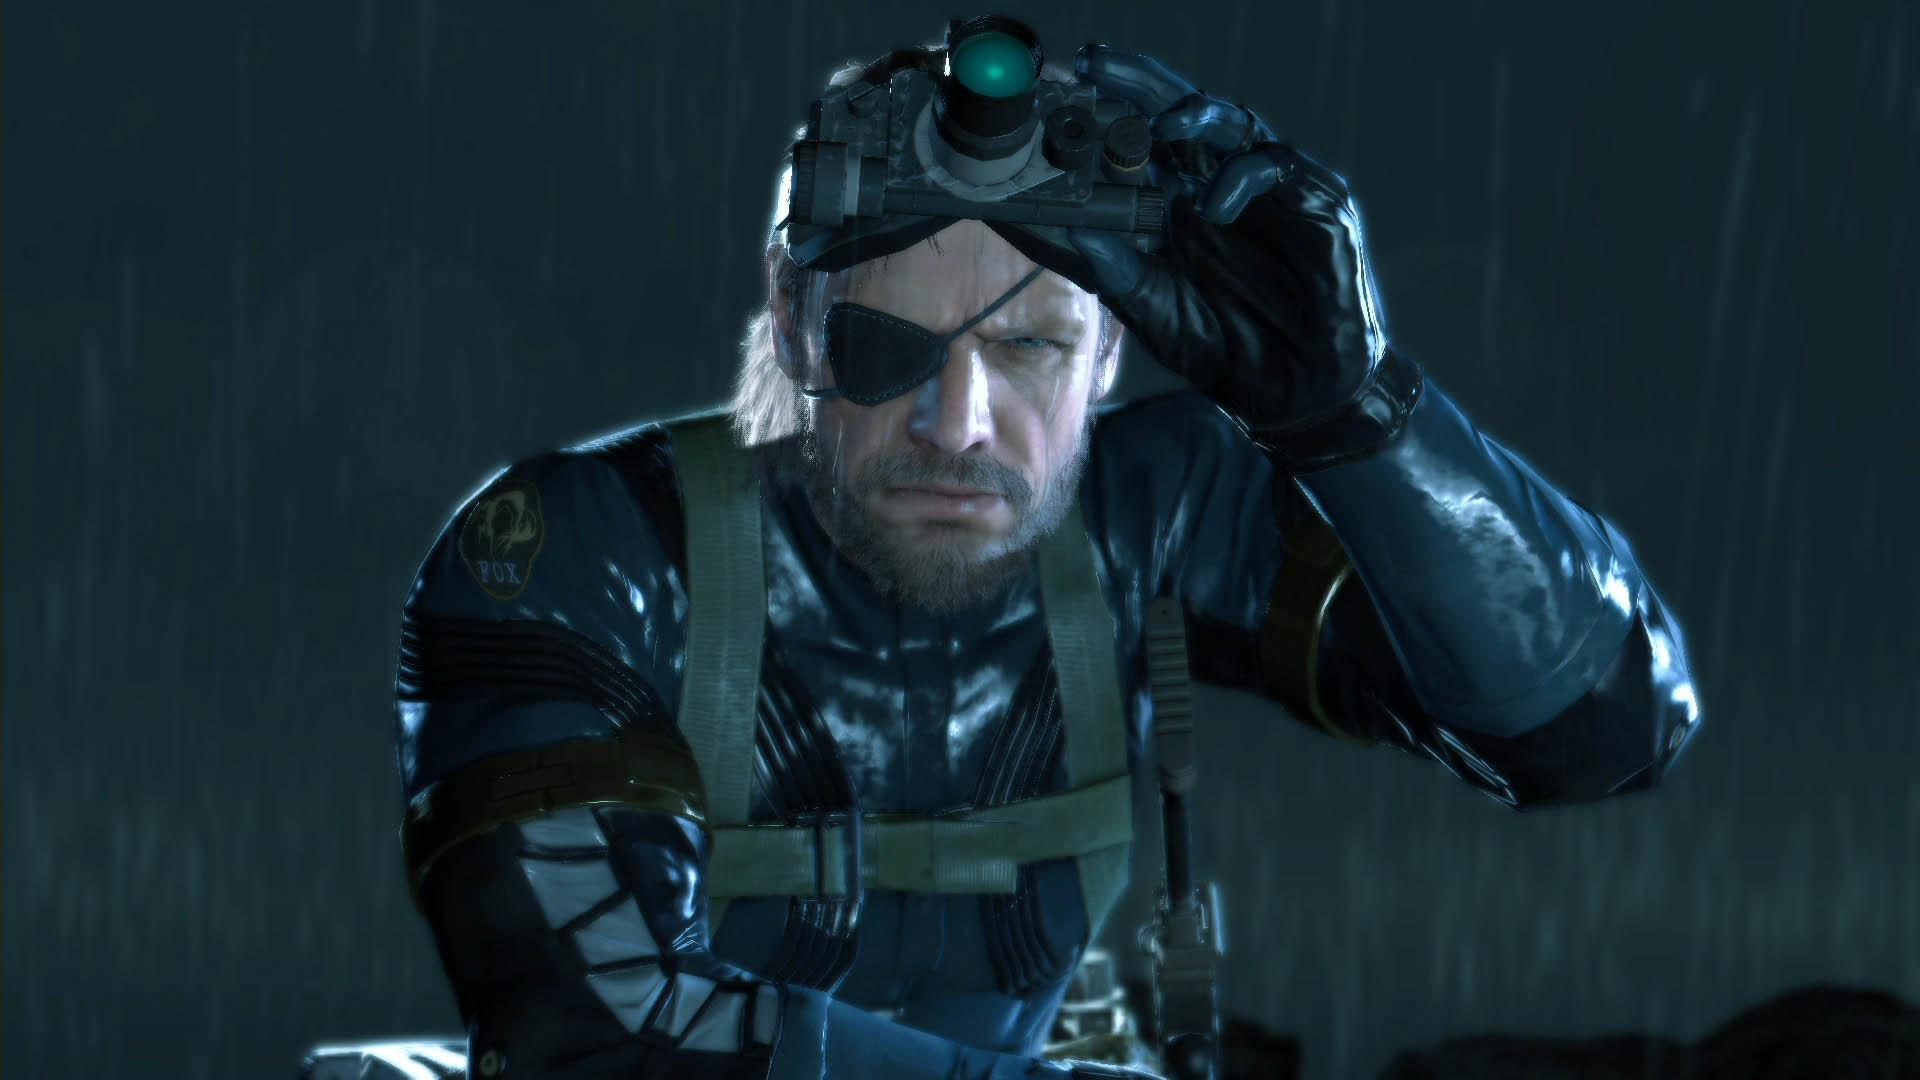 Big Boss (Venom Snake) with Night Vision Goggles – Metal Gear Solid V: